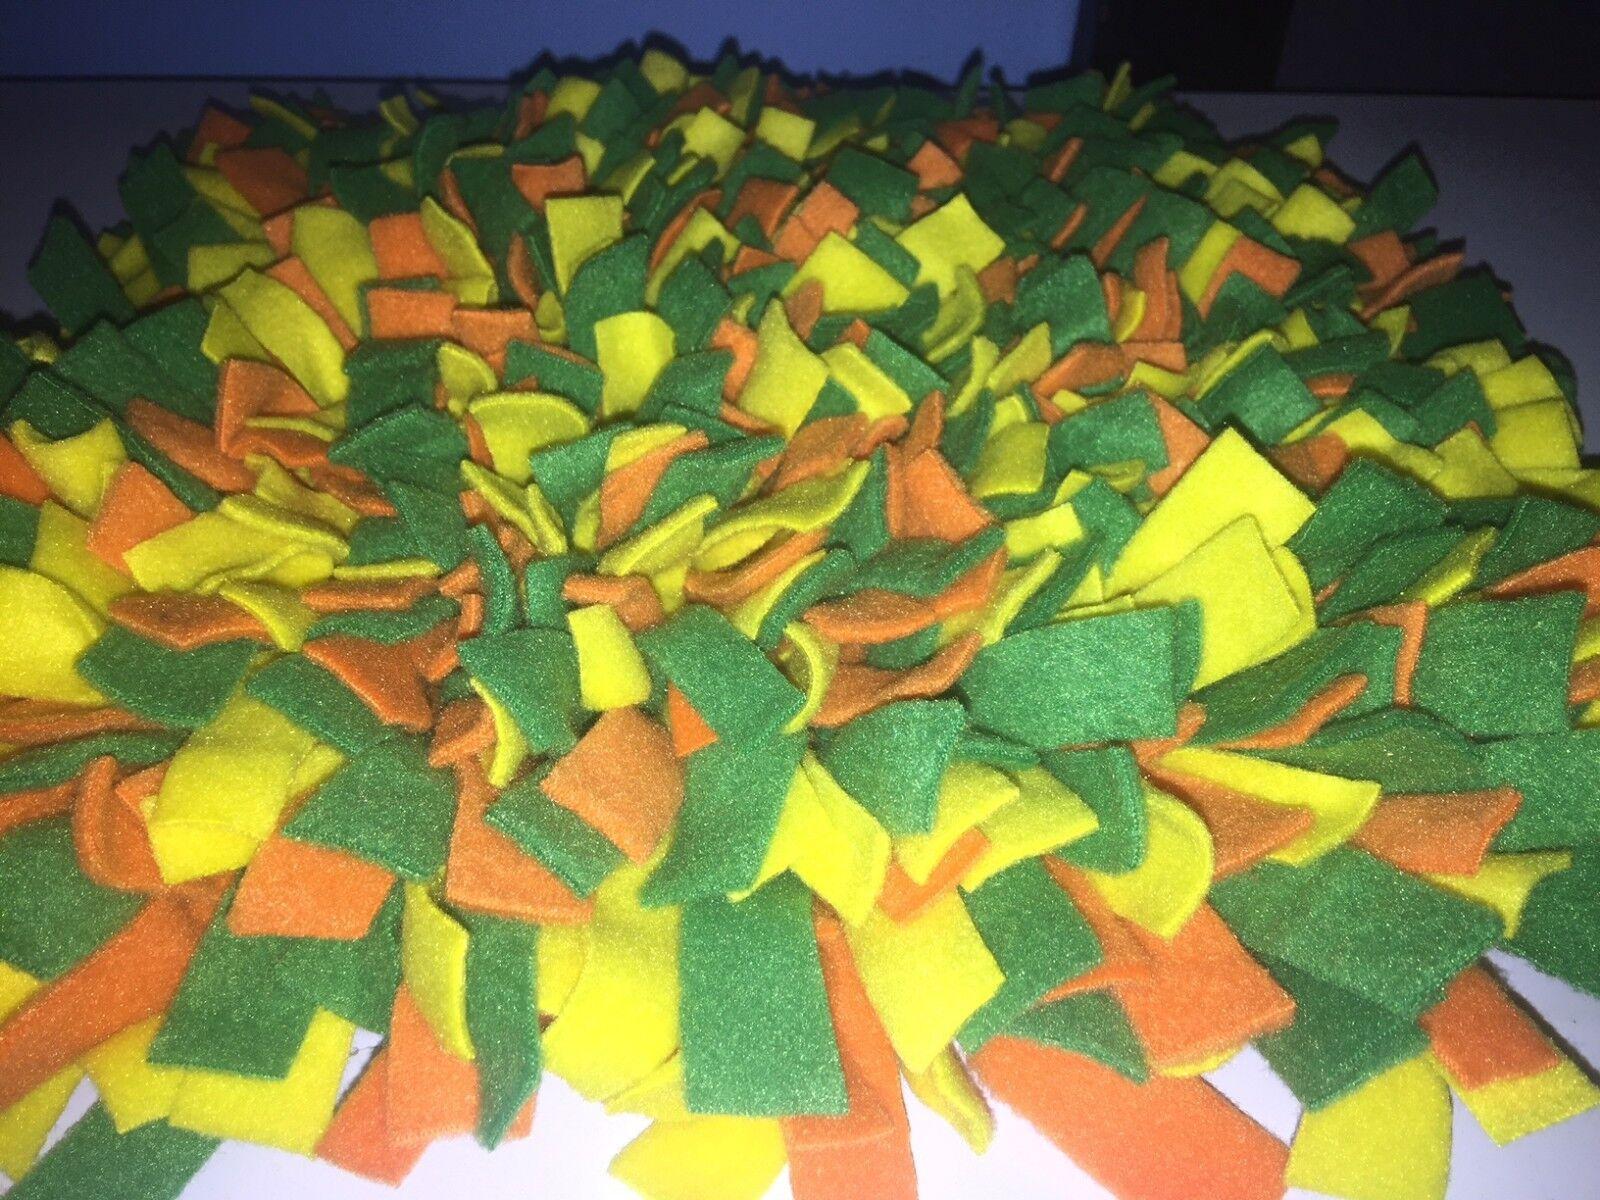 Handmade giallo verde arancia Dog Pig Snuffle Mat  Training Feeding Mats 36x24